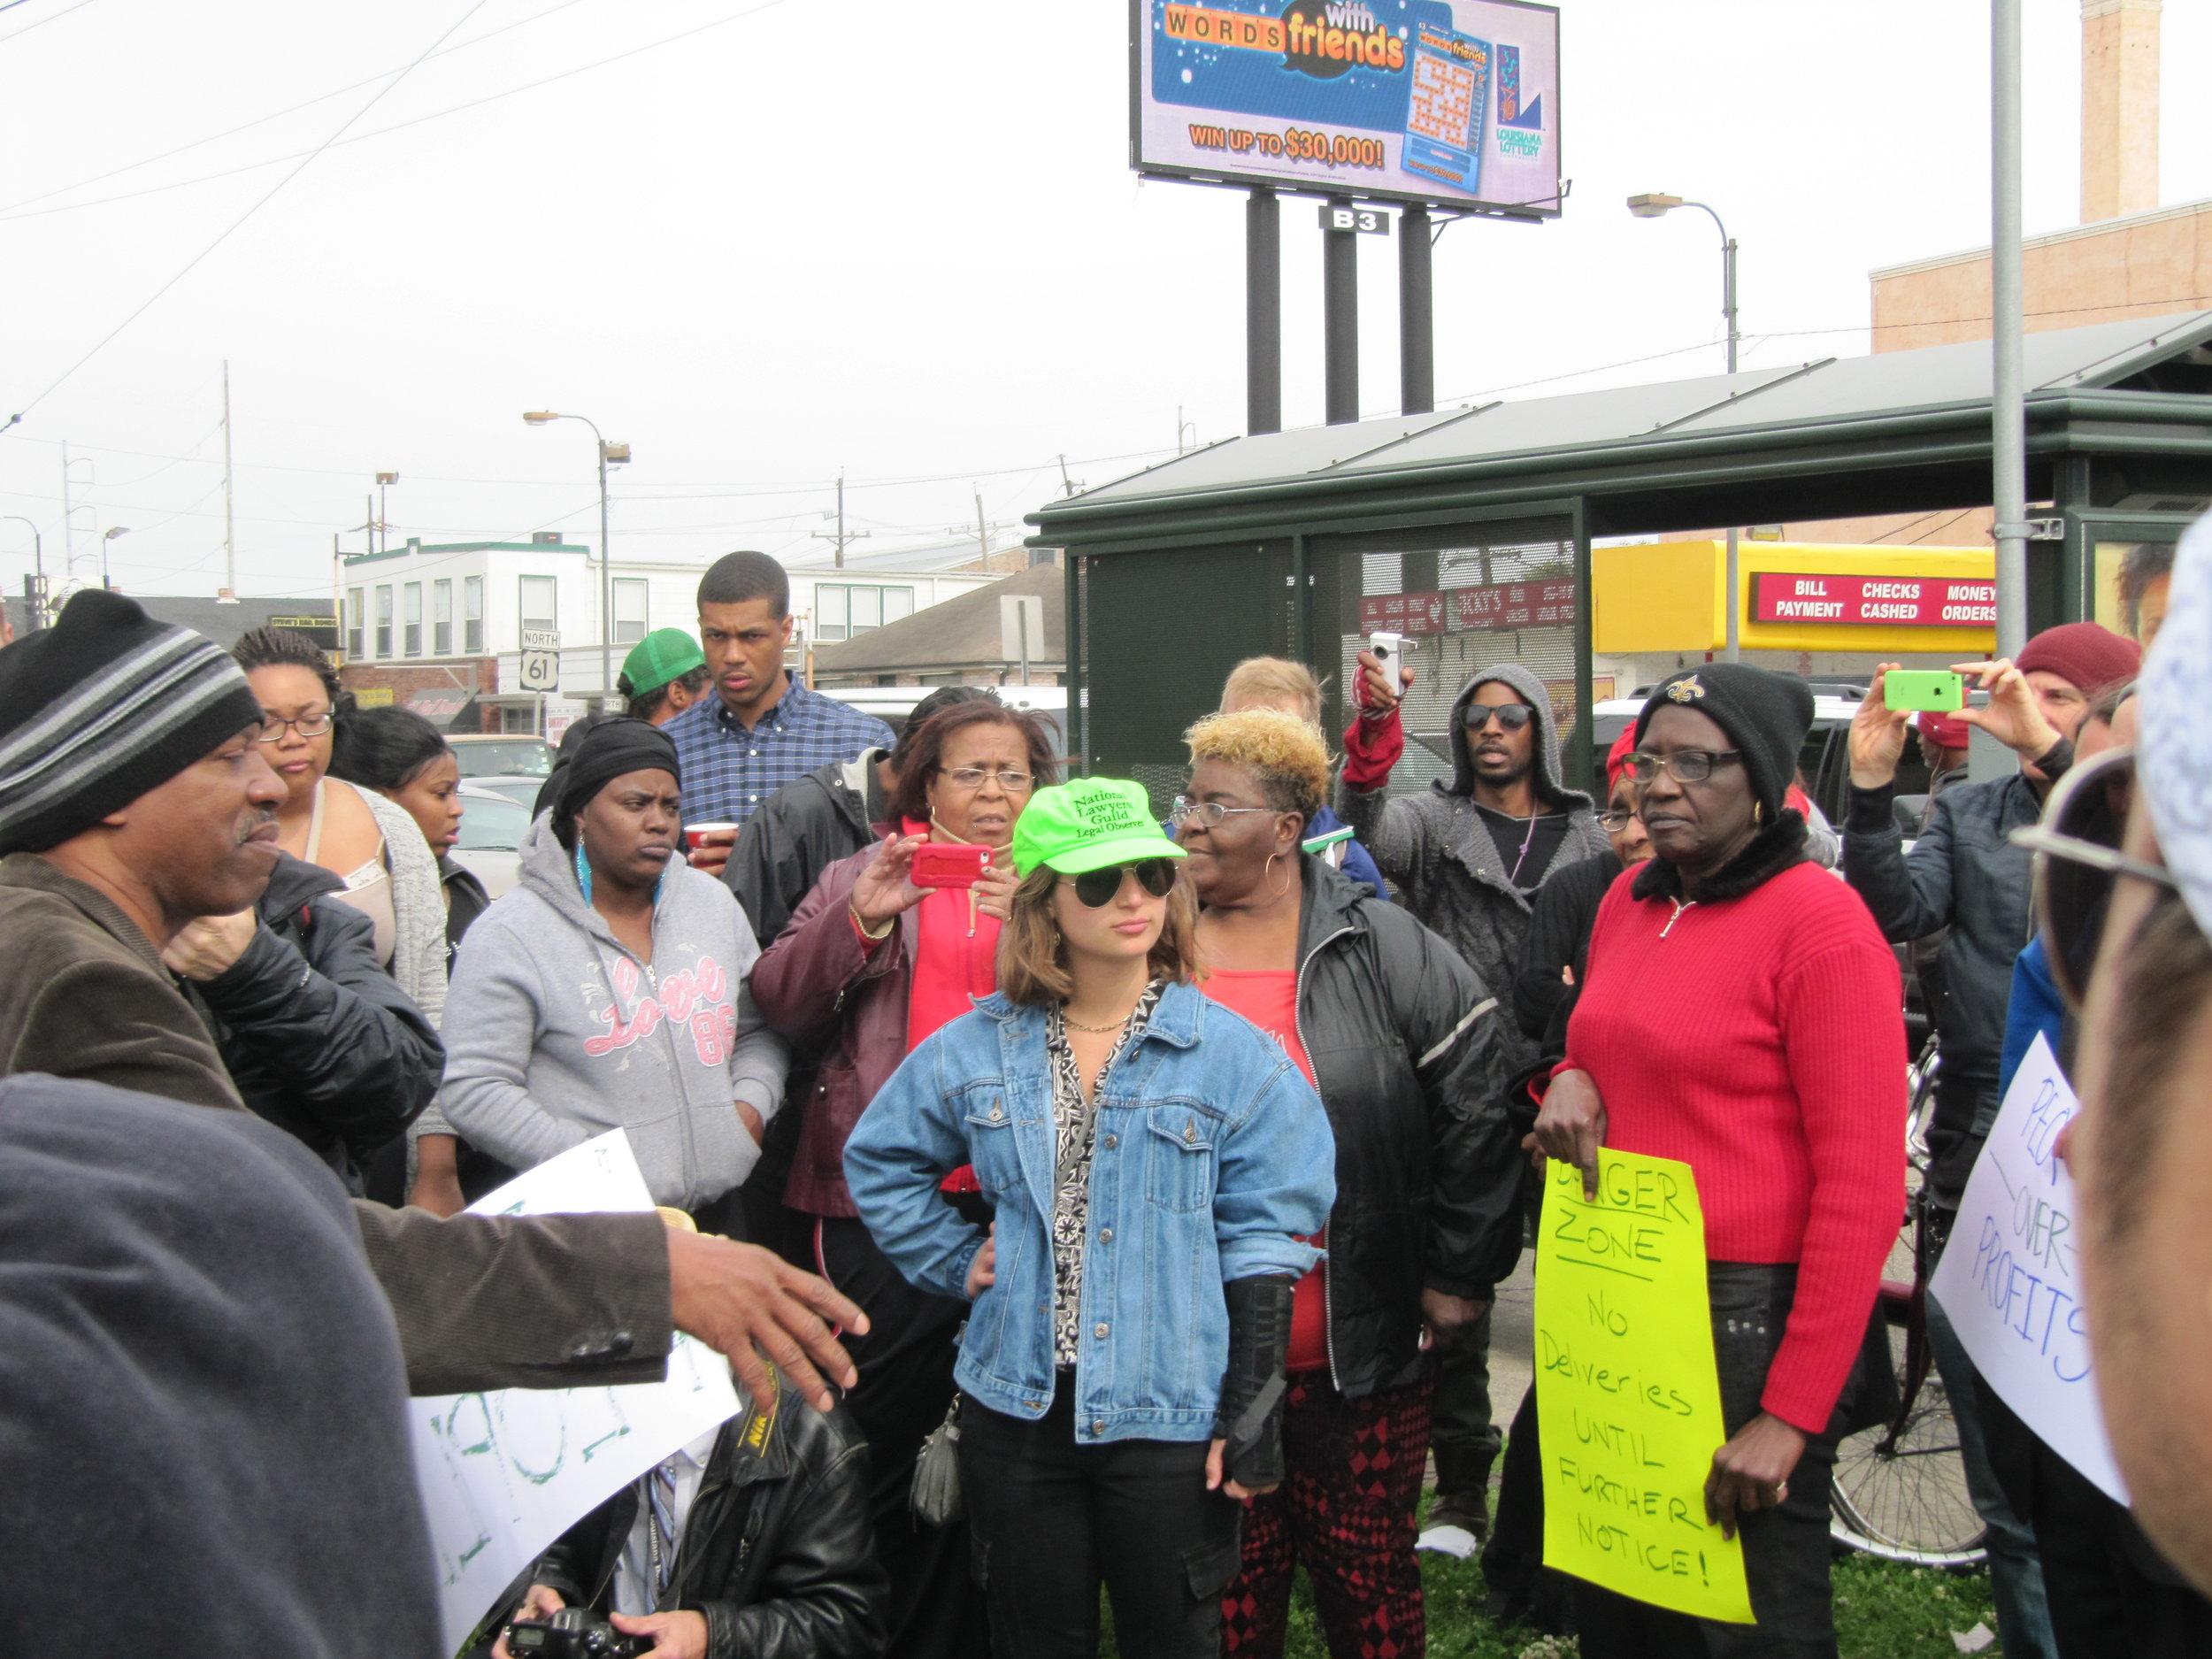 opprc-protest-3-26-14-069-copy.jpg